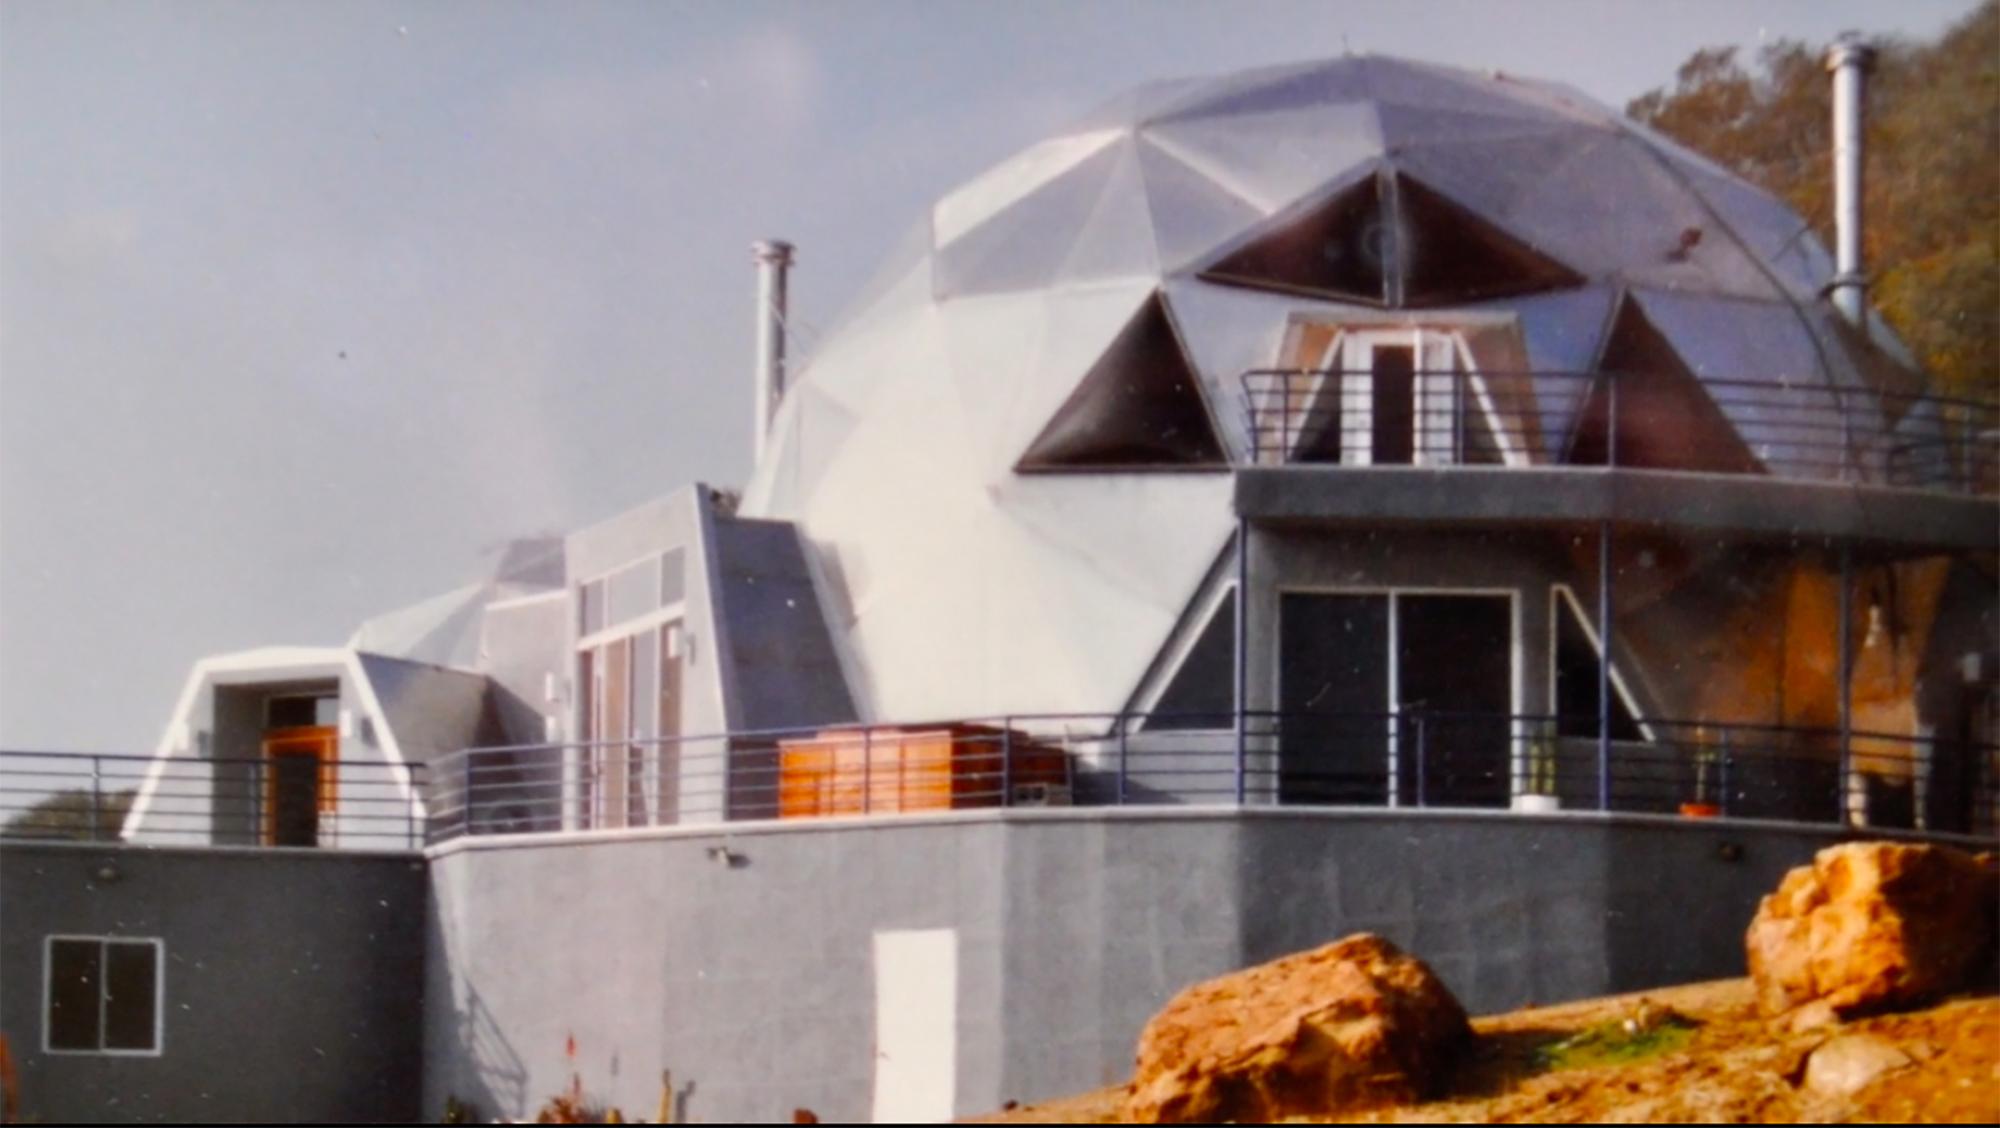 SS_Dome.jpg